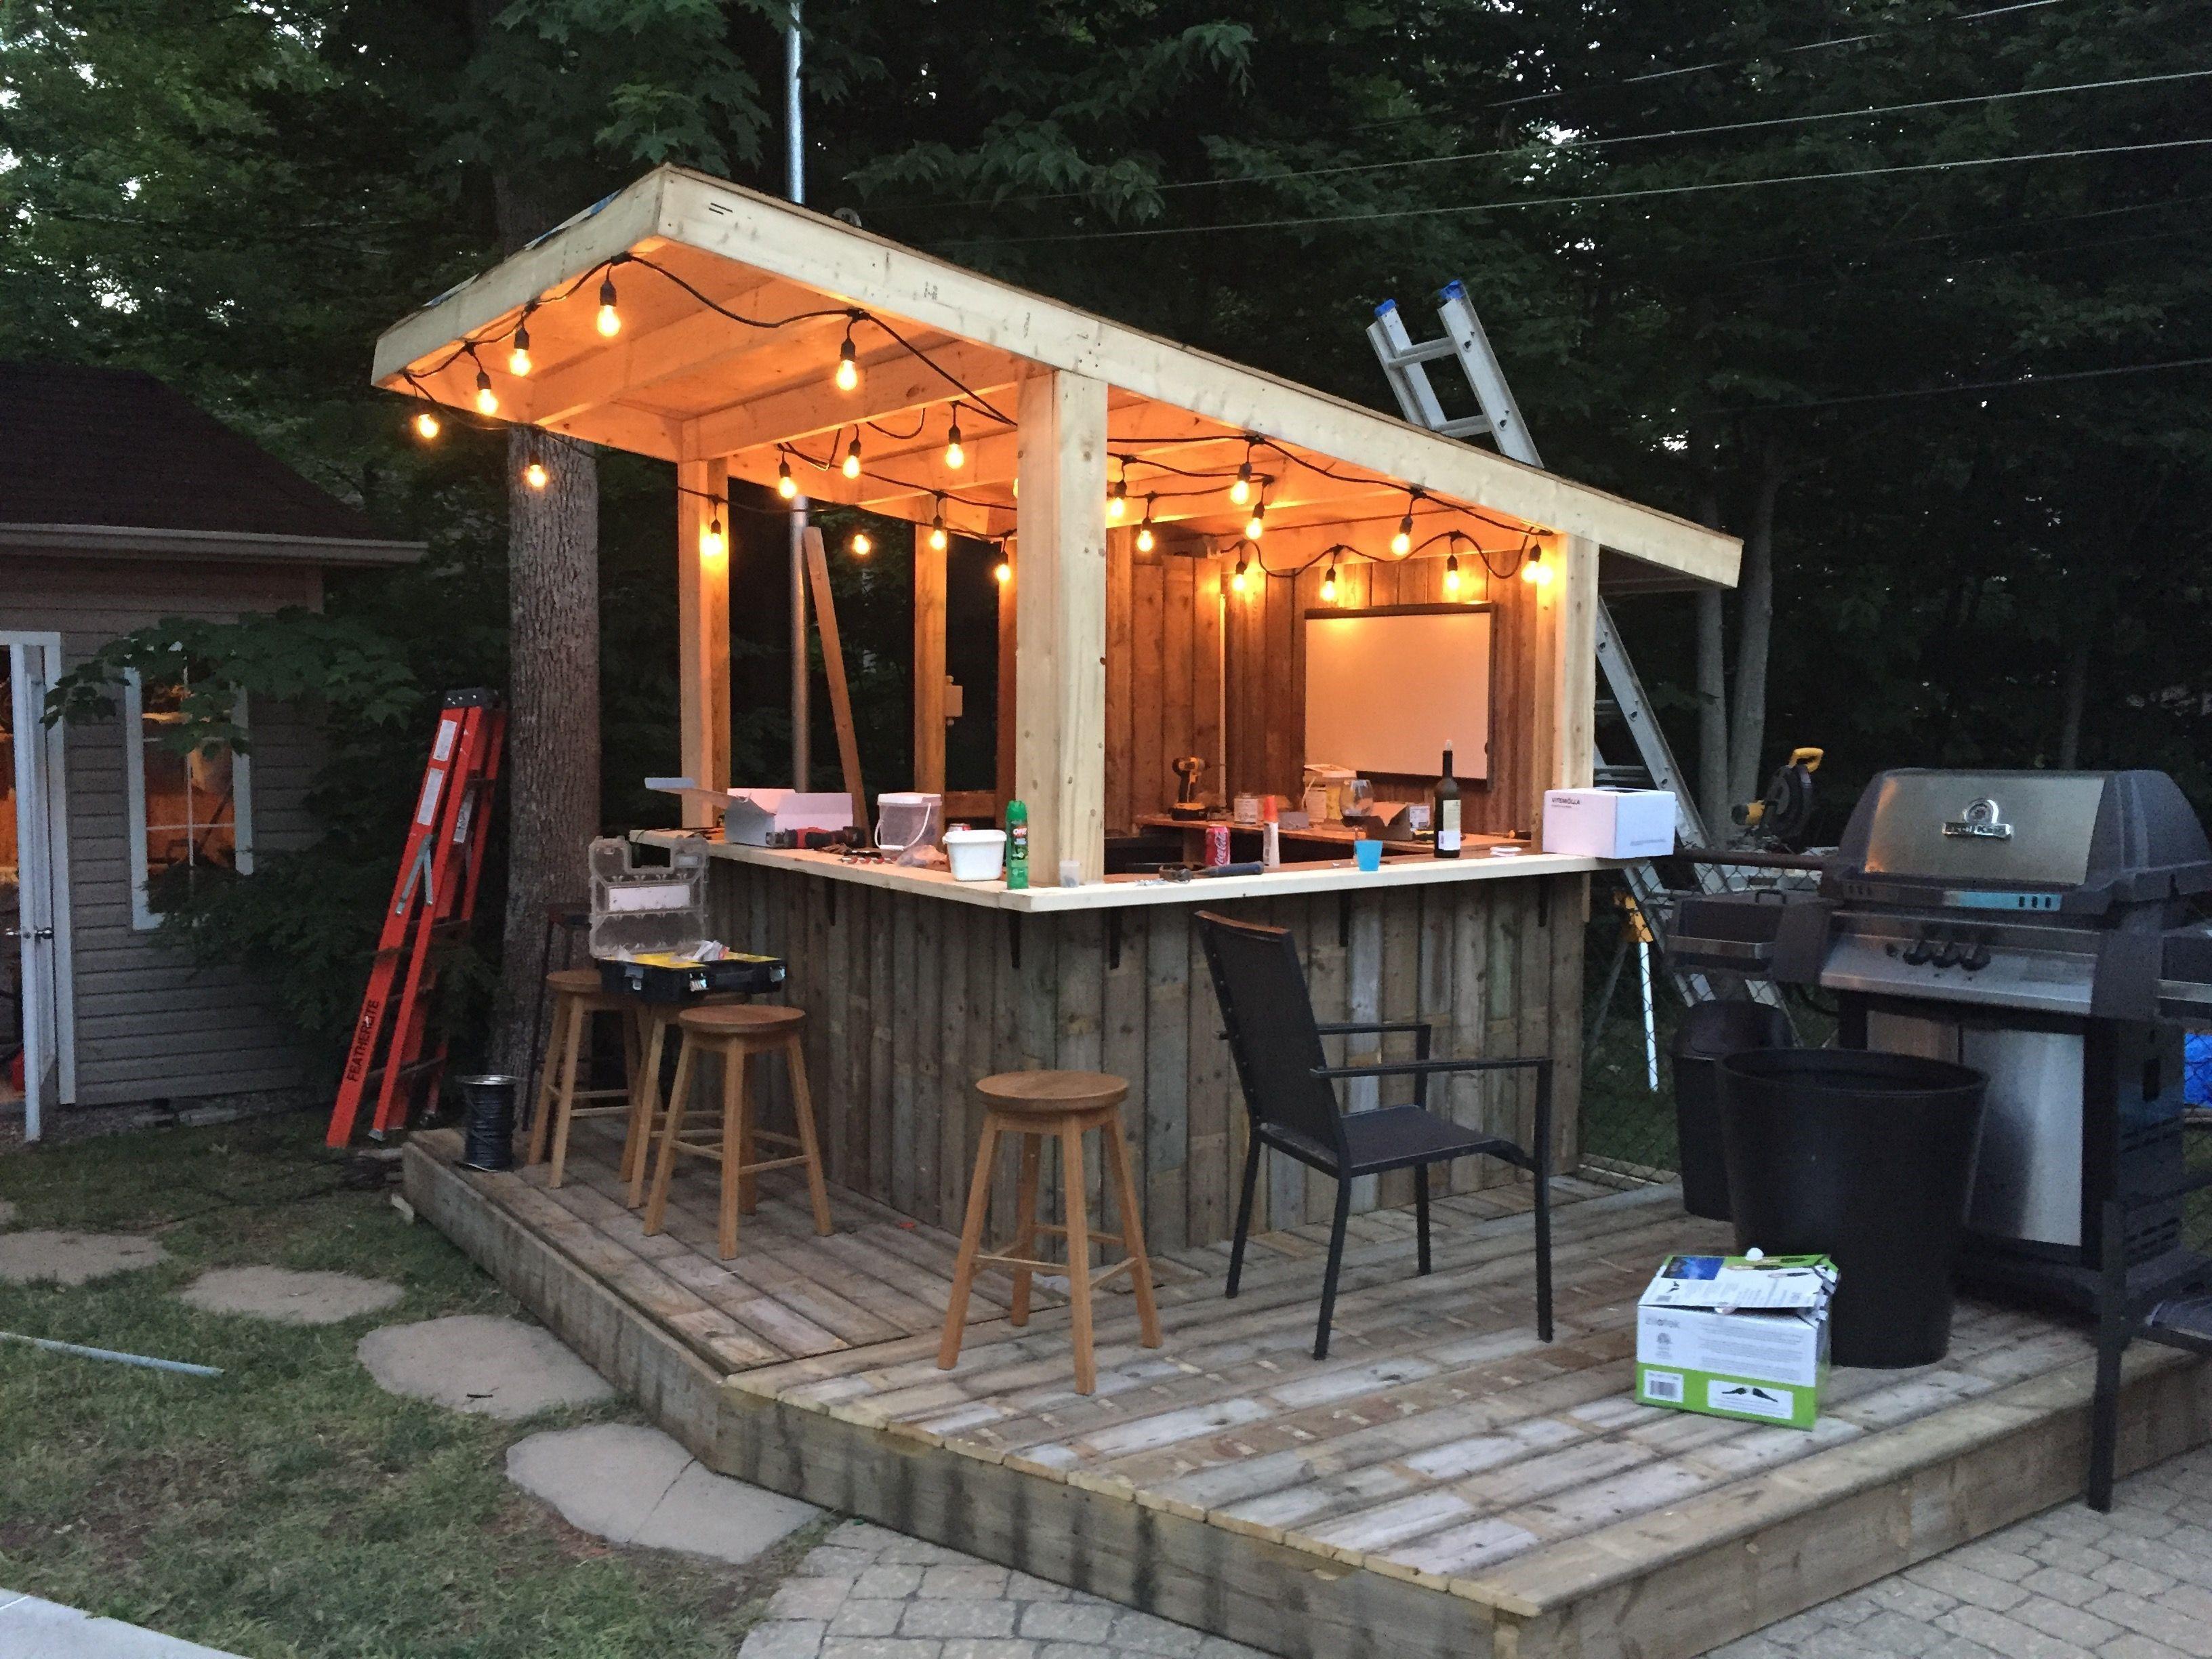 Shed DIY Tiki Bar Backyard Pool Bar built with old patio wood